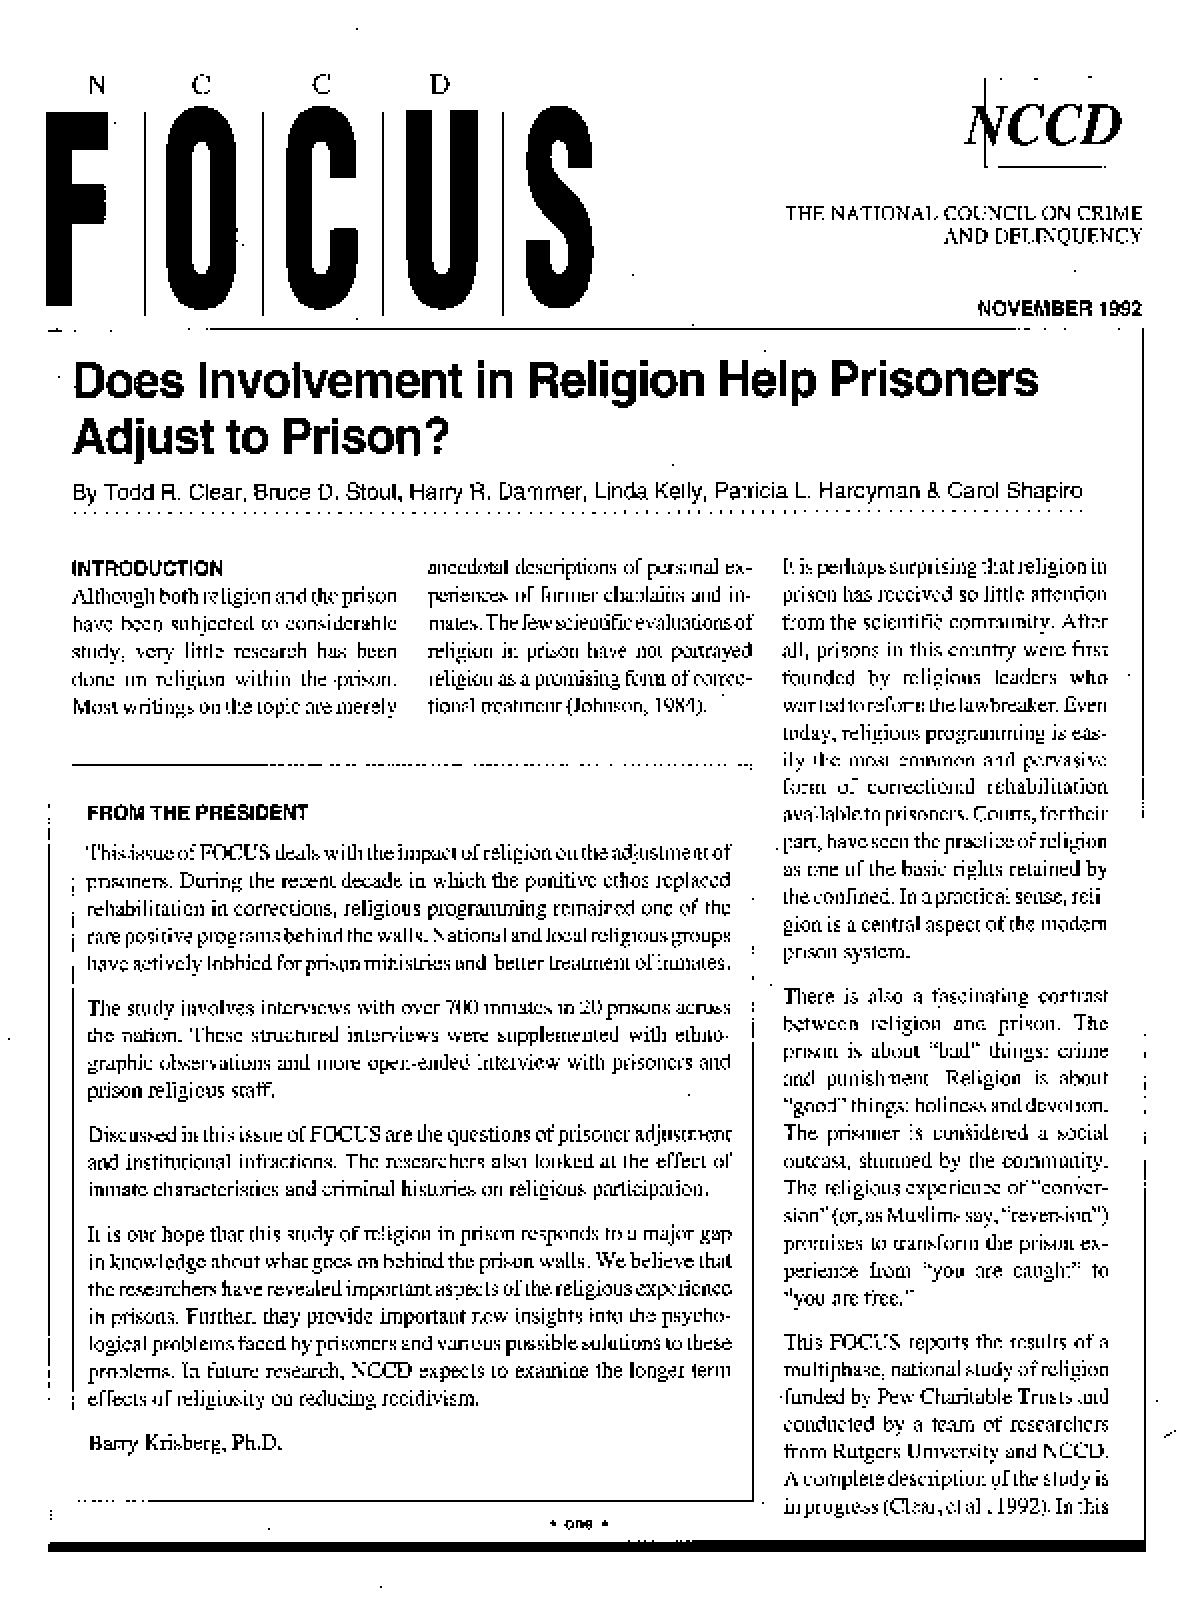 Does Involvement in Religion Help Prisoners Adjust to Prison? (FOCUS)